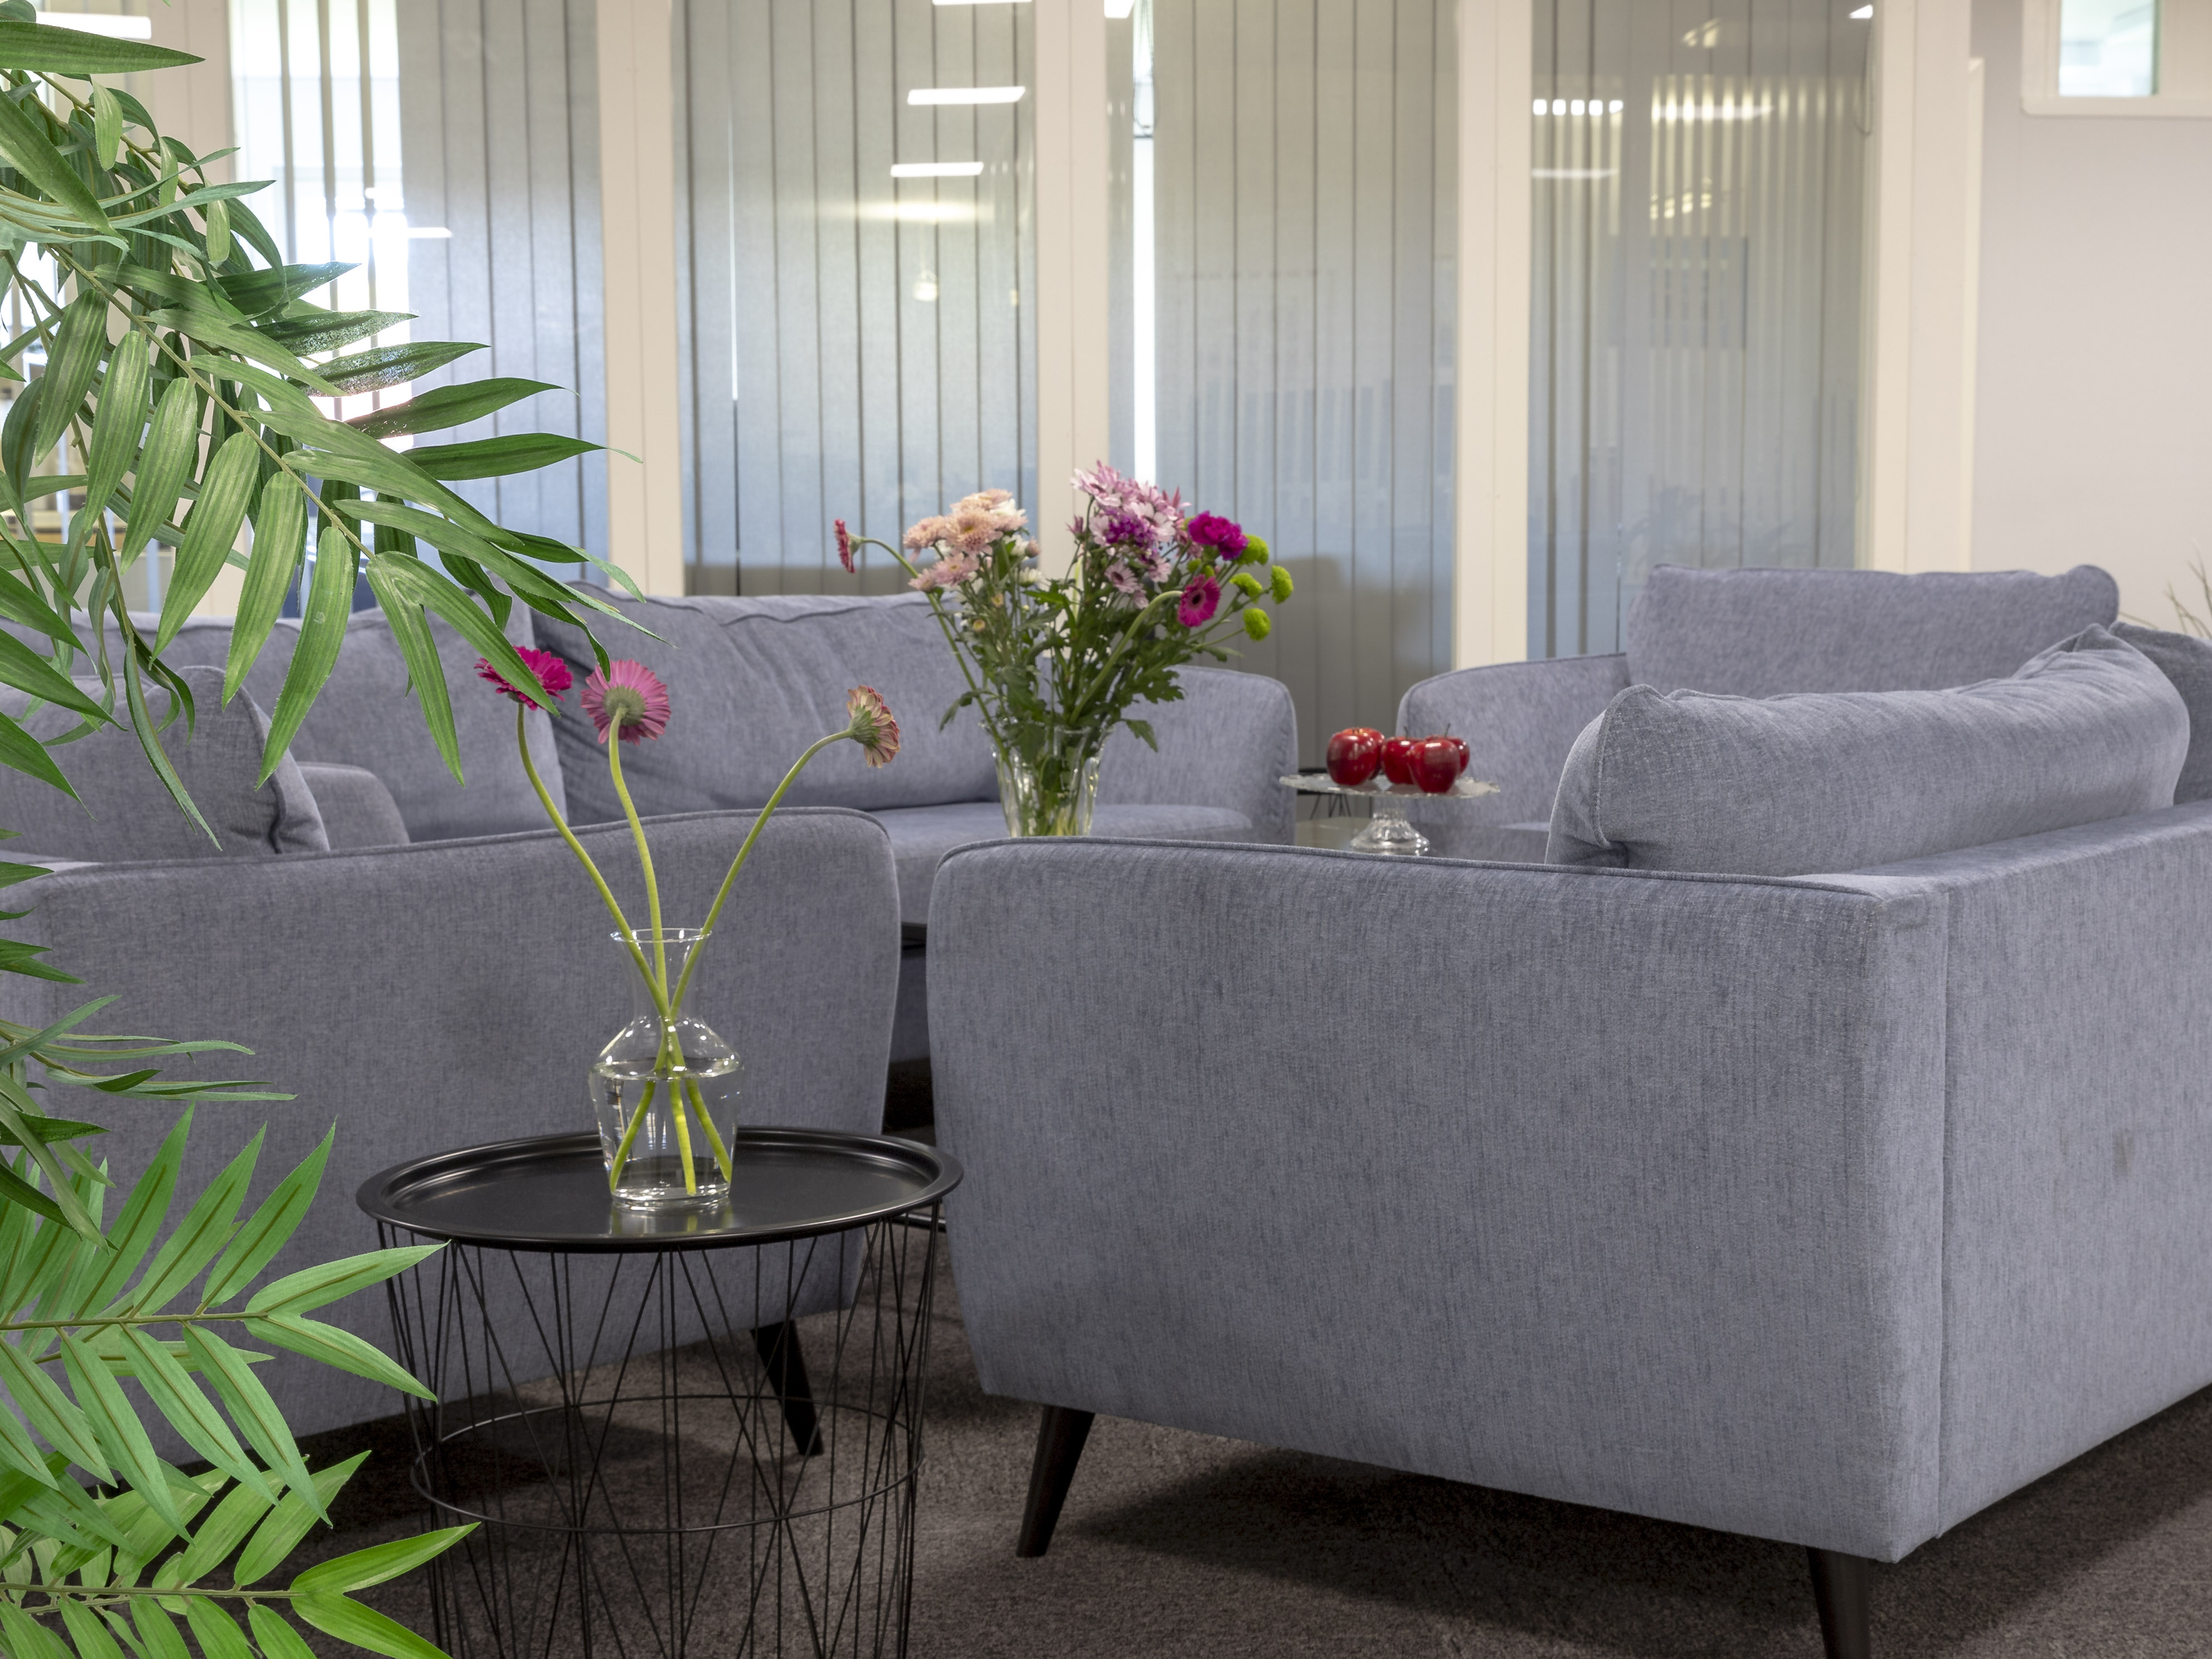 lokaler o kontor bild 2